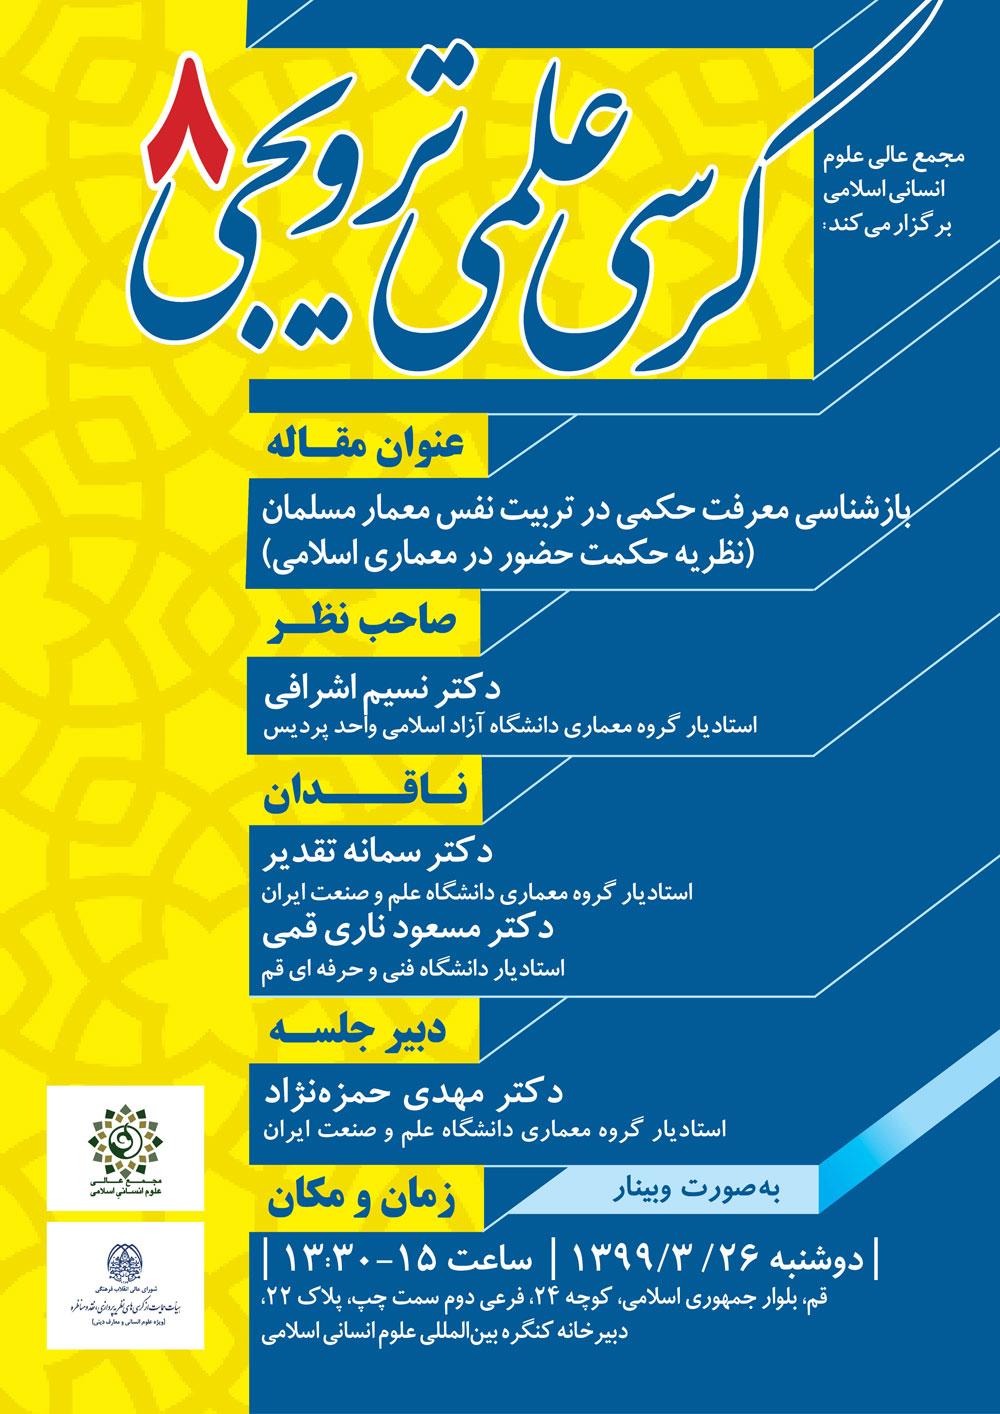 Korsi899903241 - هشتمین کرسی ترویجی مجمع عالی علوم انسانی اسلامی برگزار میشود